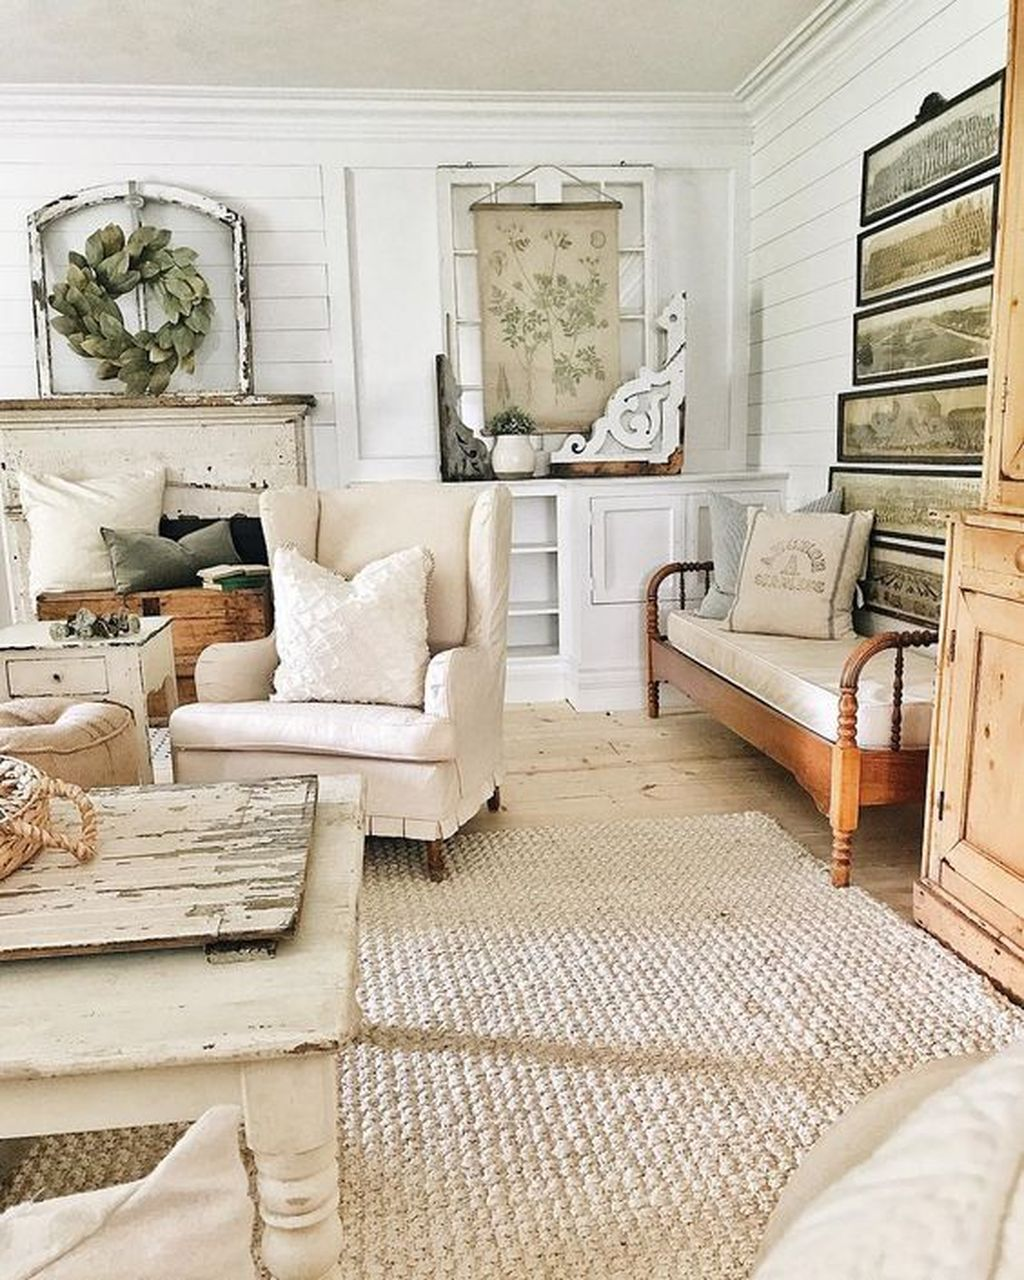 36 Fabulous Southern Style Home Decor Ideas